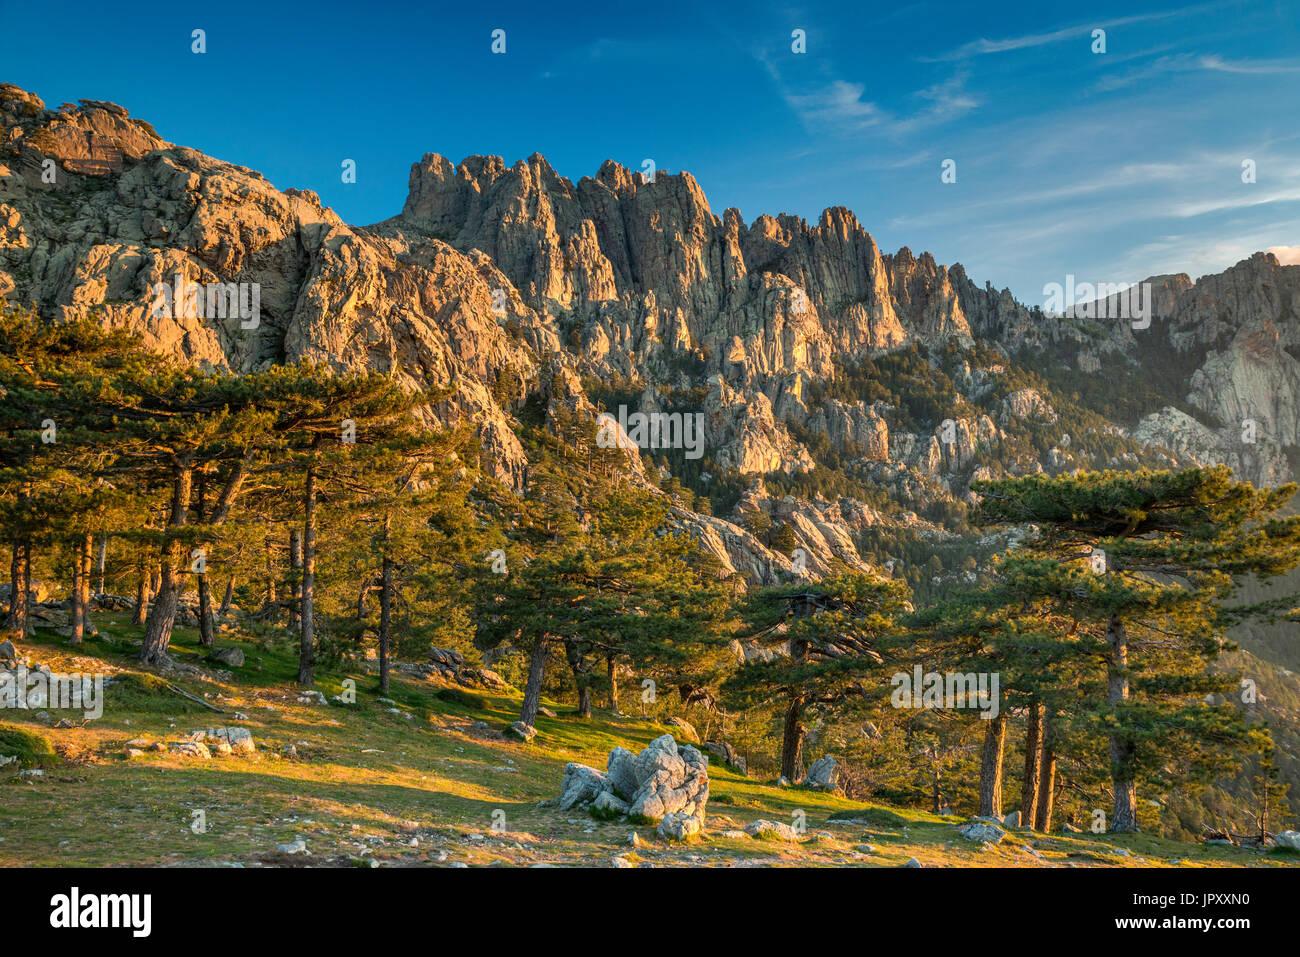 Aiguilles de Bavella, Aussicht bei Sonnenaufgang vom Col de Bavella, Corse-du-Sud, Korsika, Frankreich Stockbild